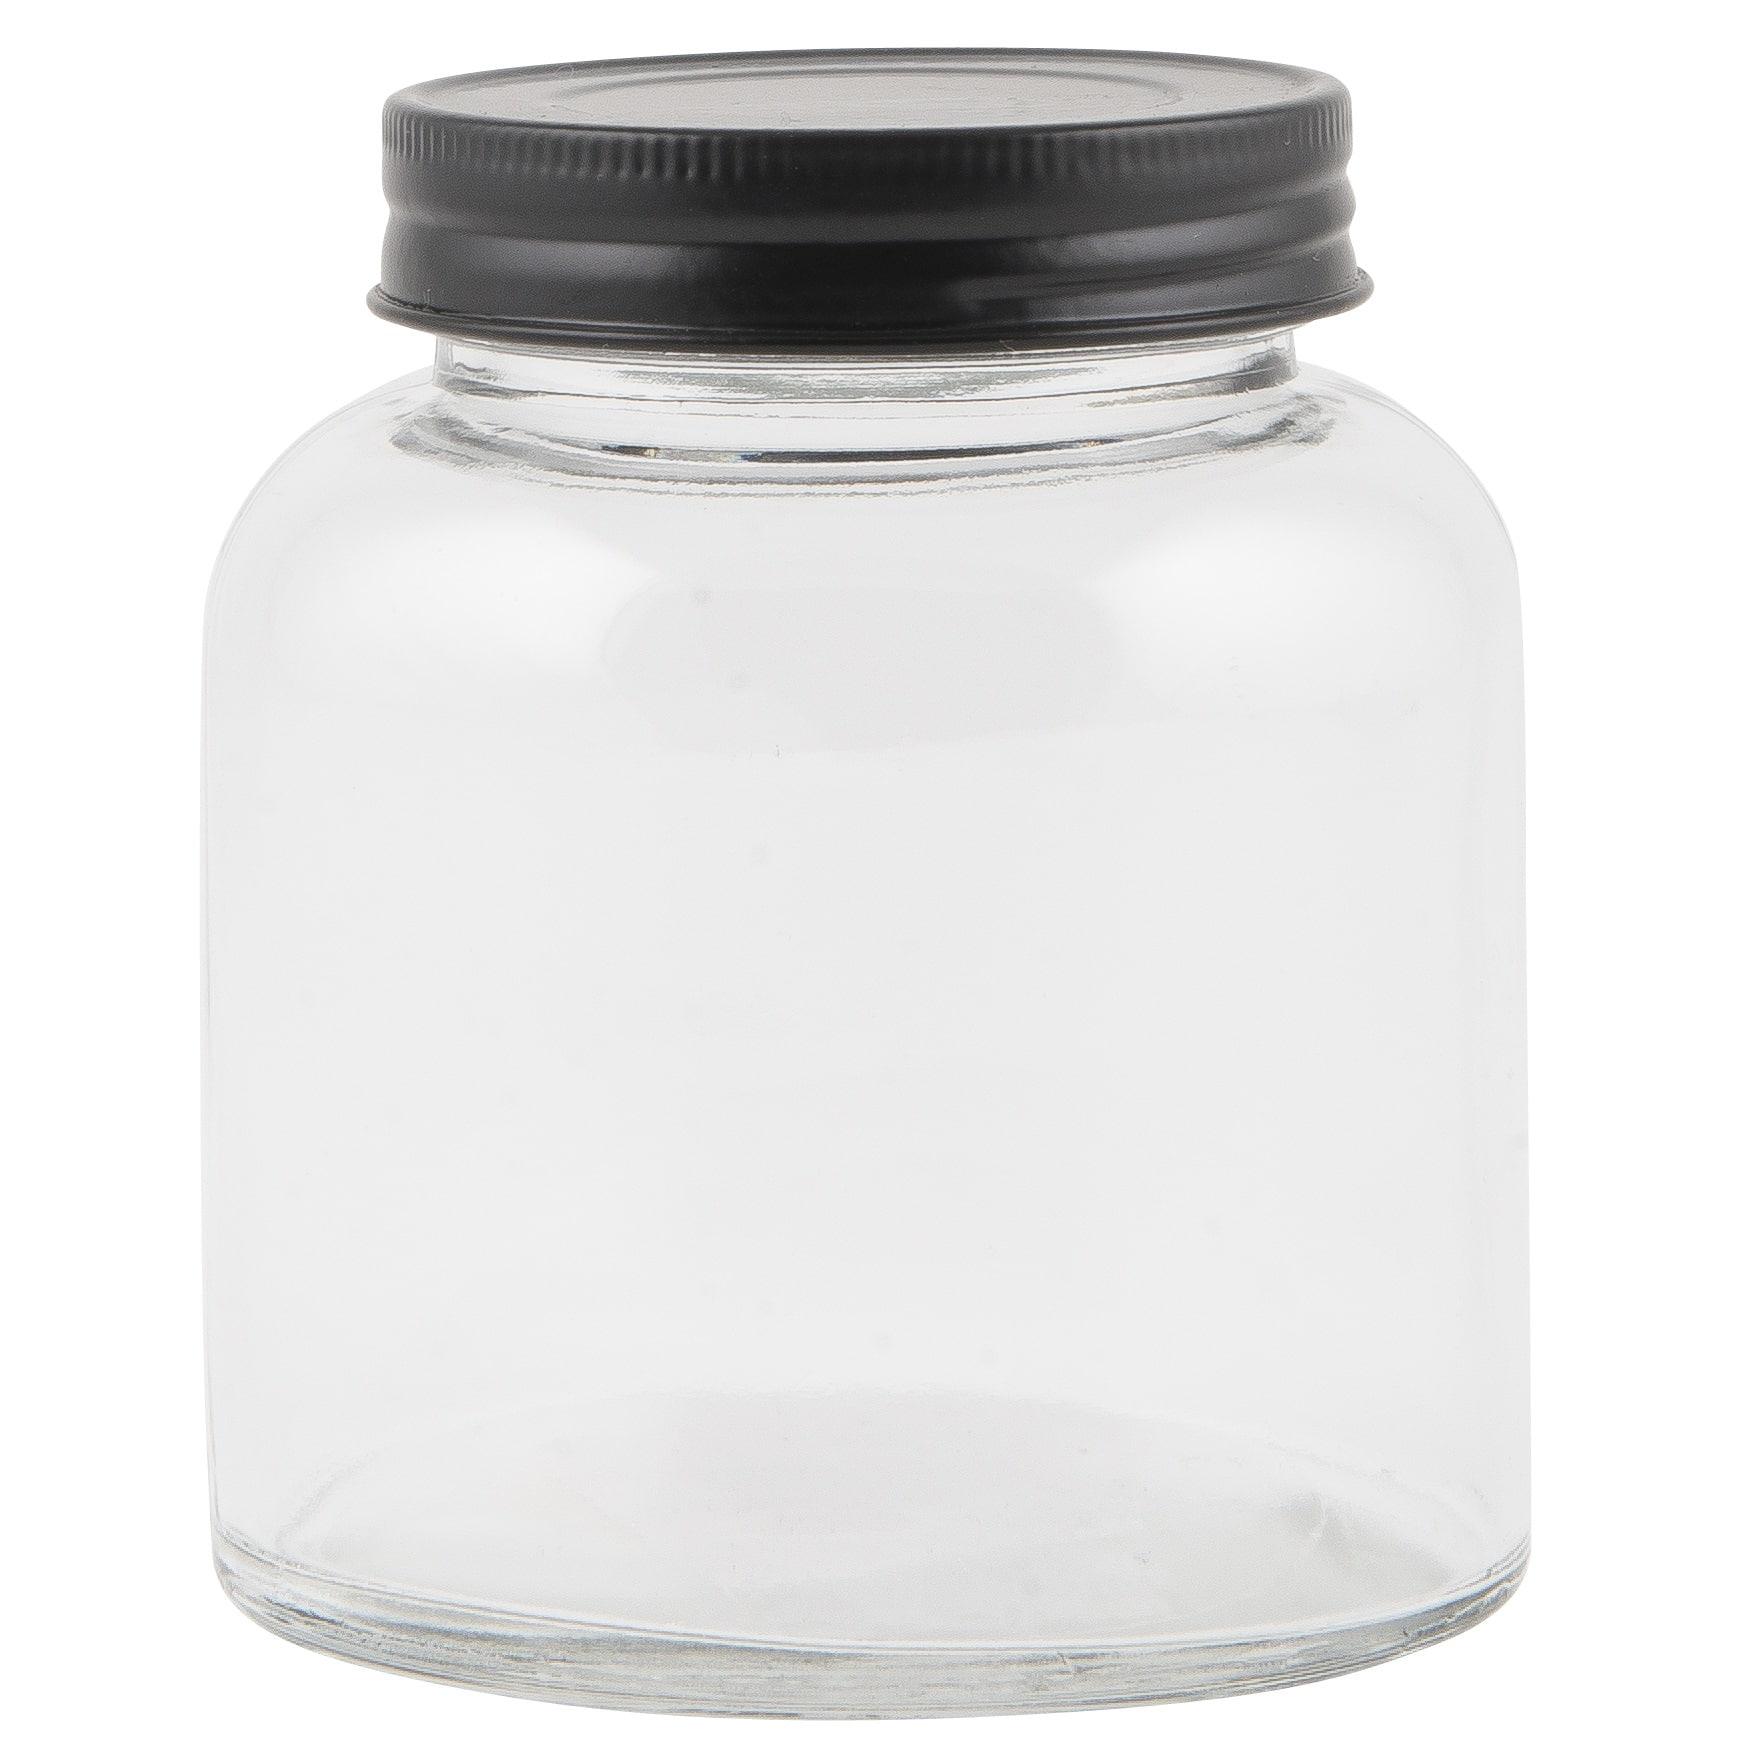 IB LAURSEN Skleněná dózička na koření - 300 ml, černá barva, čirá barva, sklo, kov